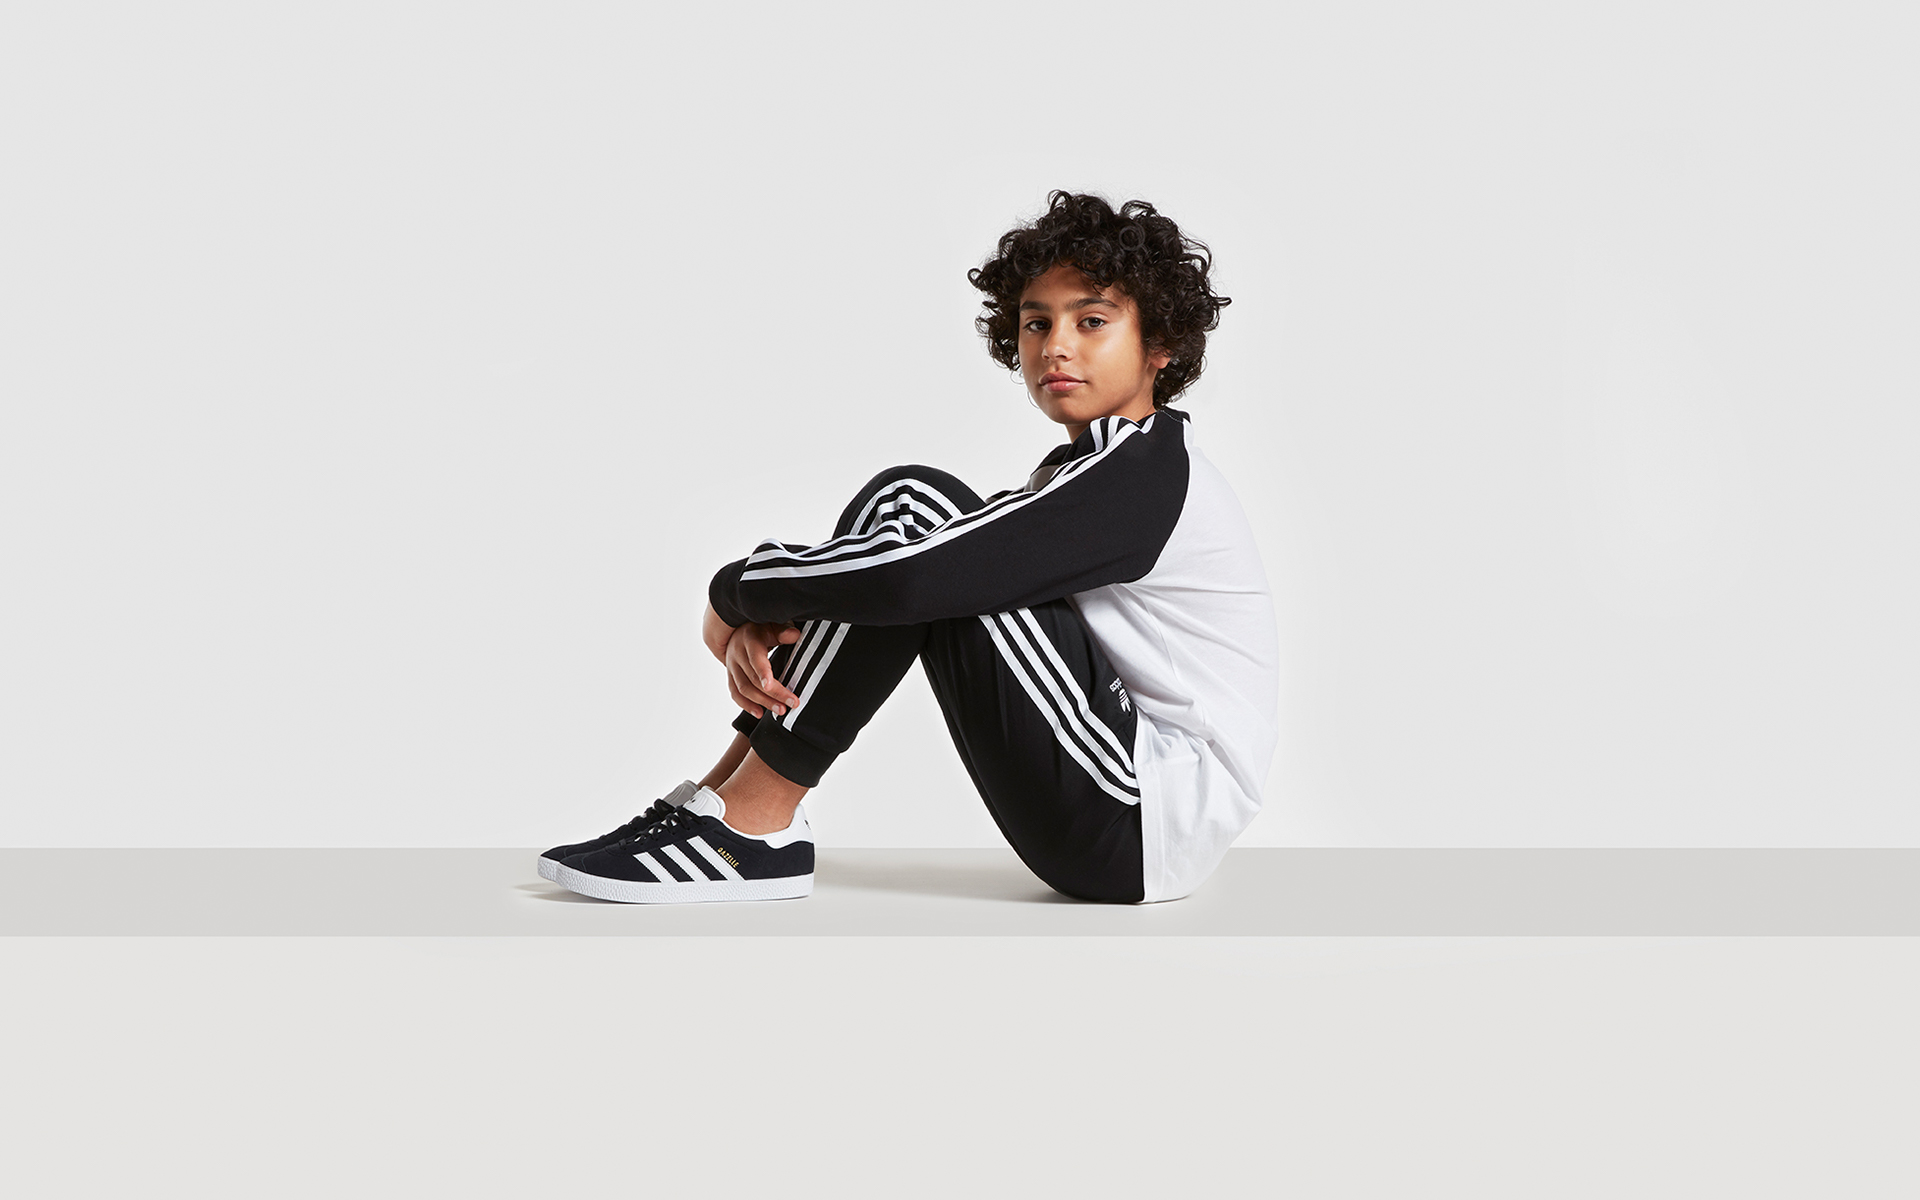 181011-adidas-kids_02_DenverSolo